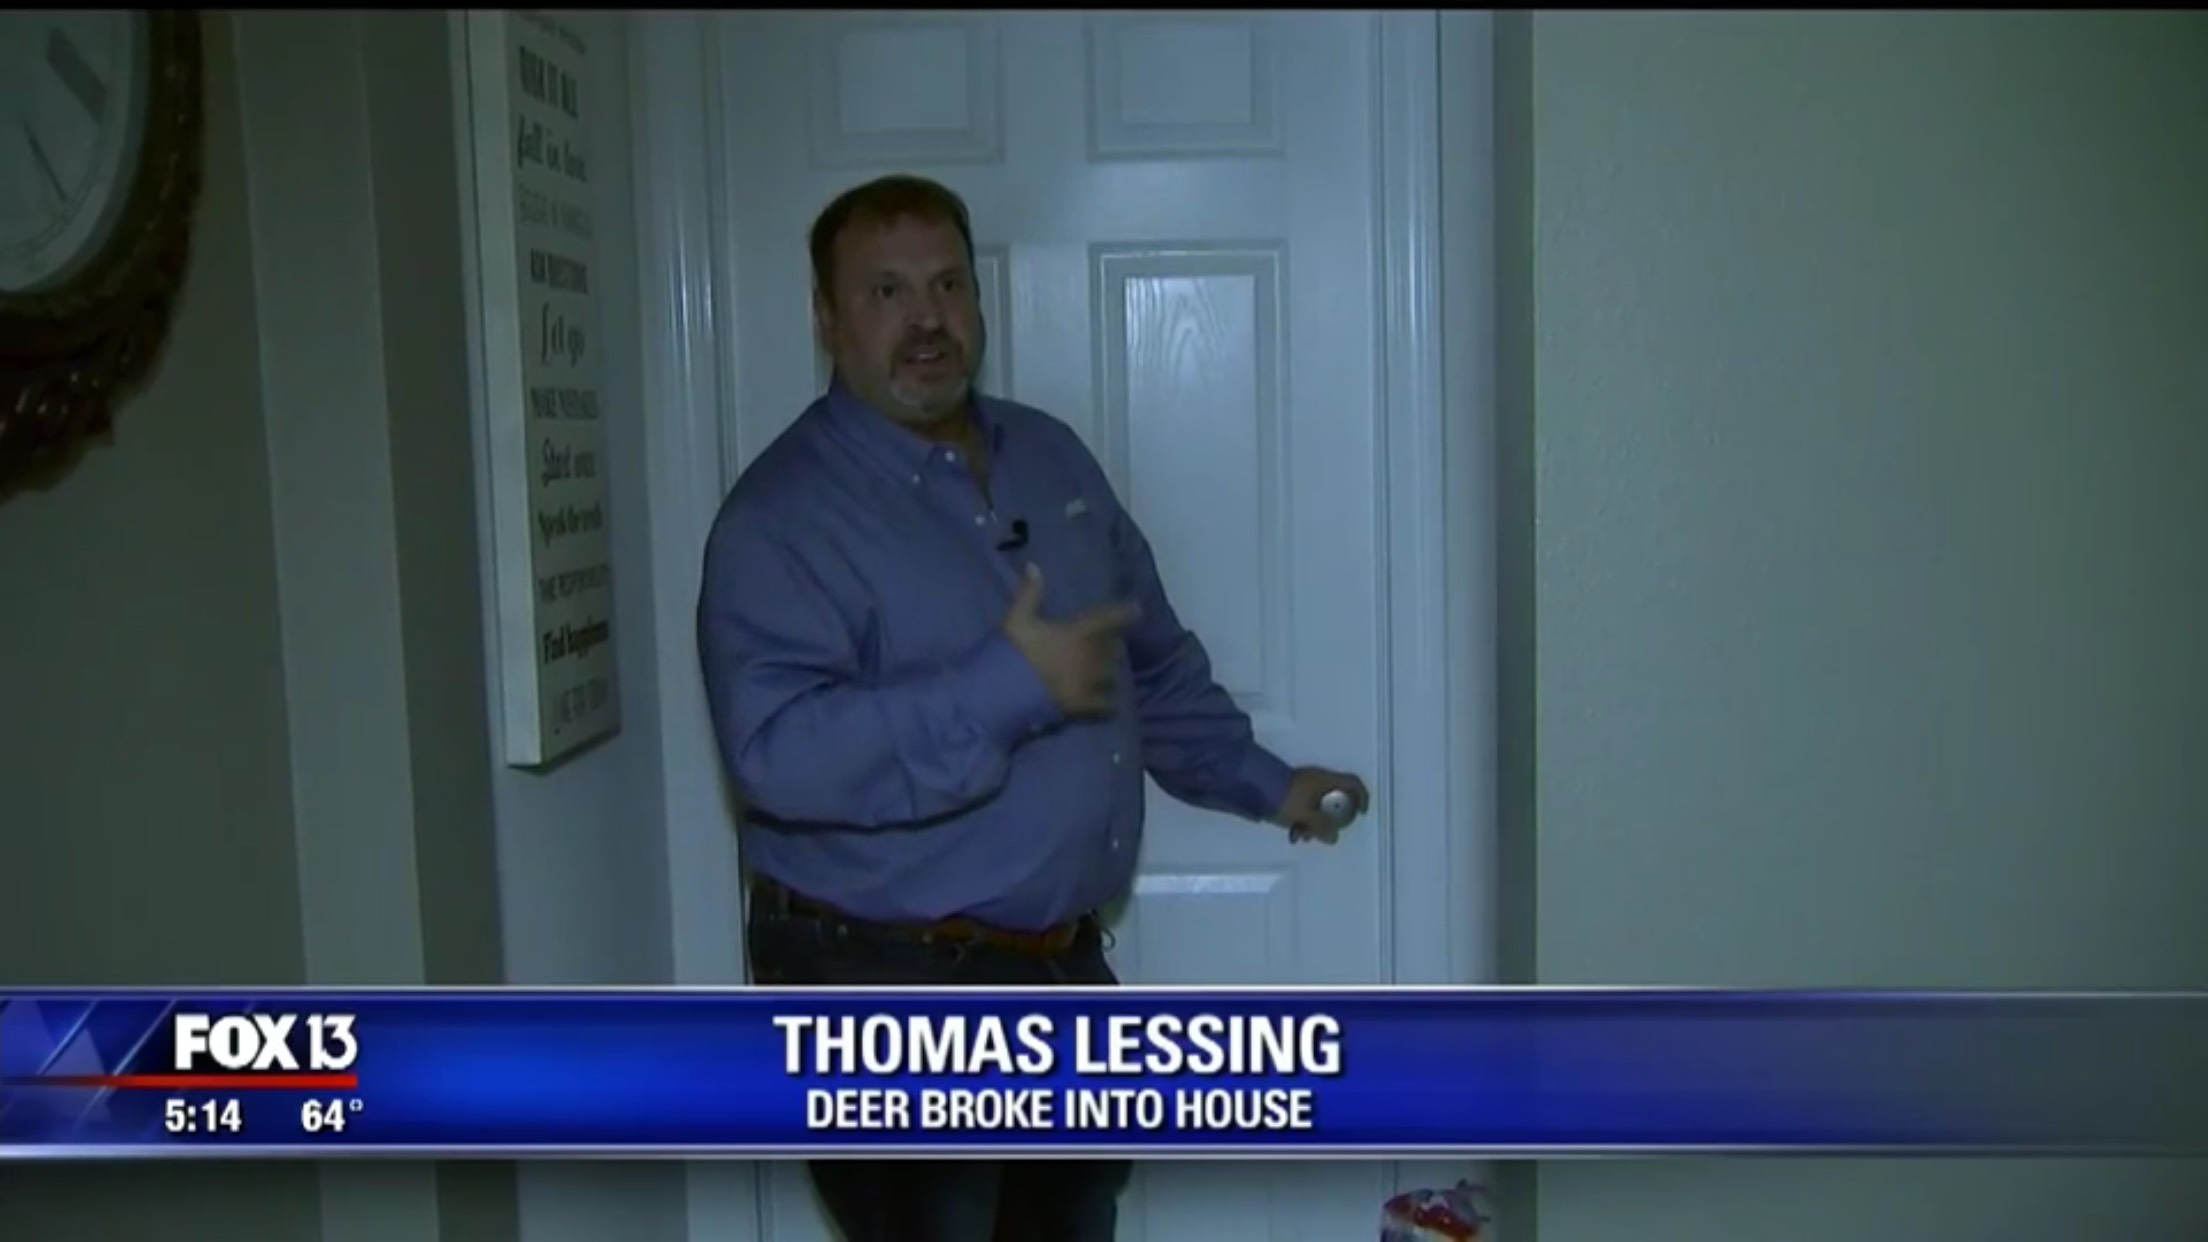 Thomas Lessing: Deer Broke Into House